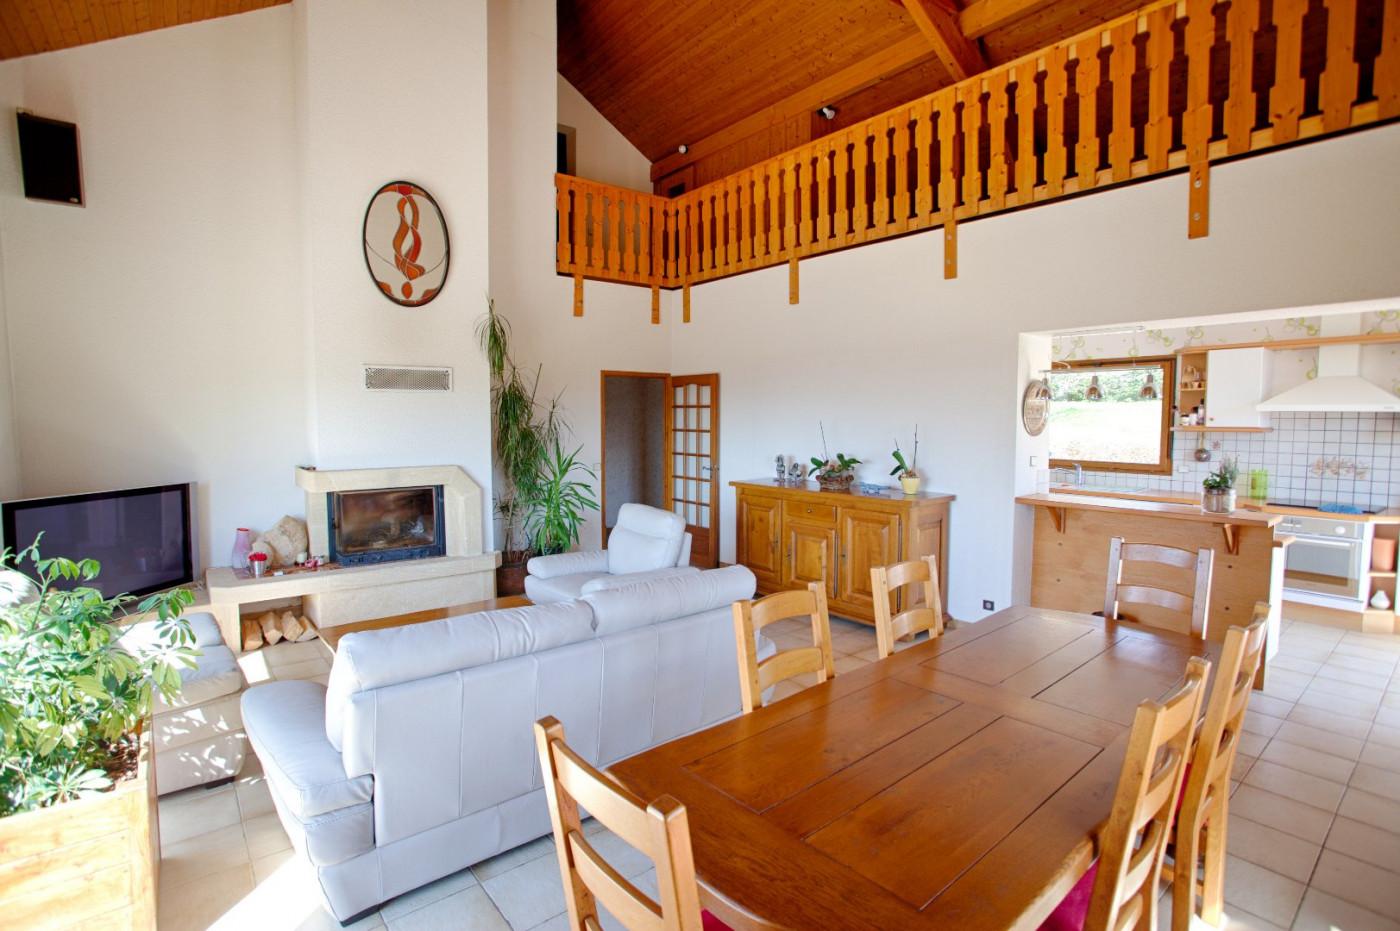 A vendre Villaz 7402345 Resonance immobilière